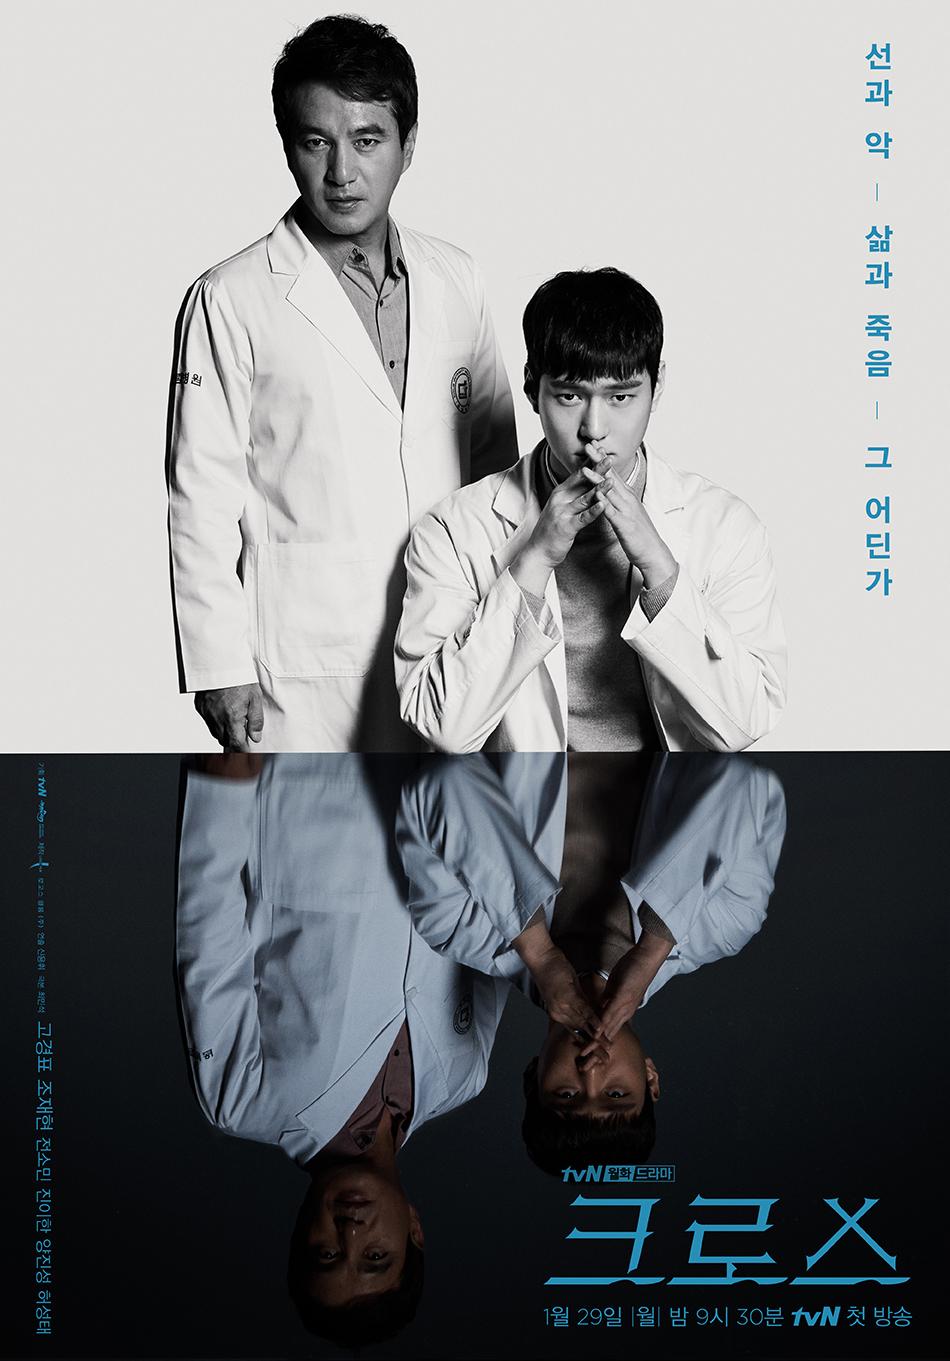 Cross (tvN)